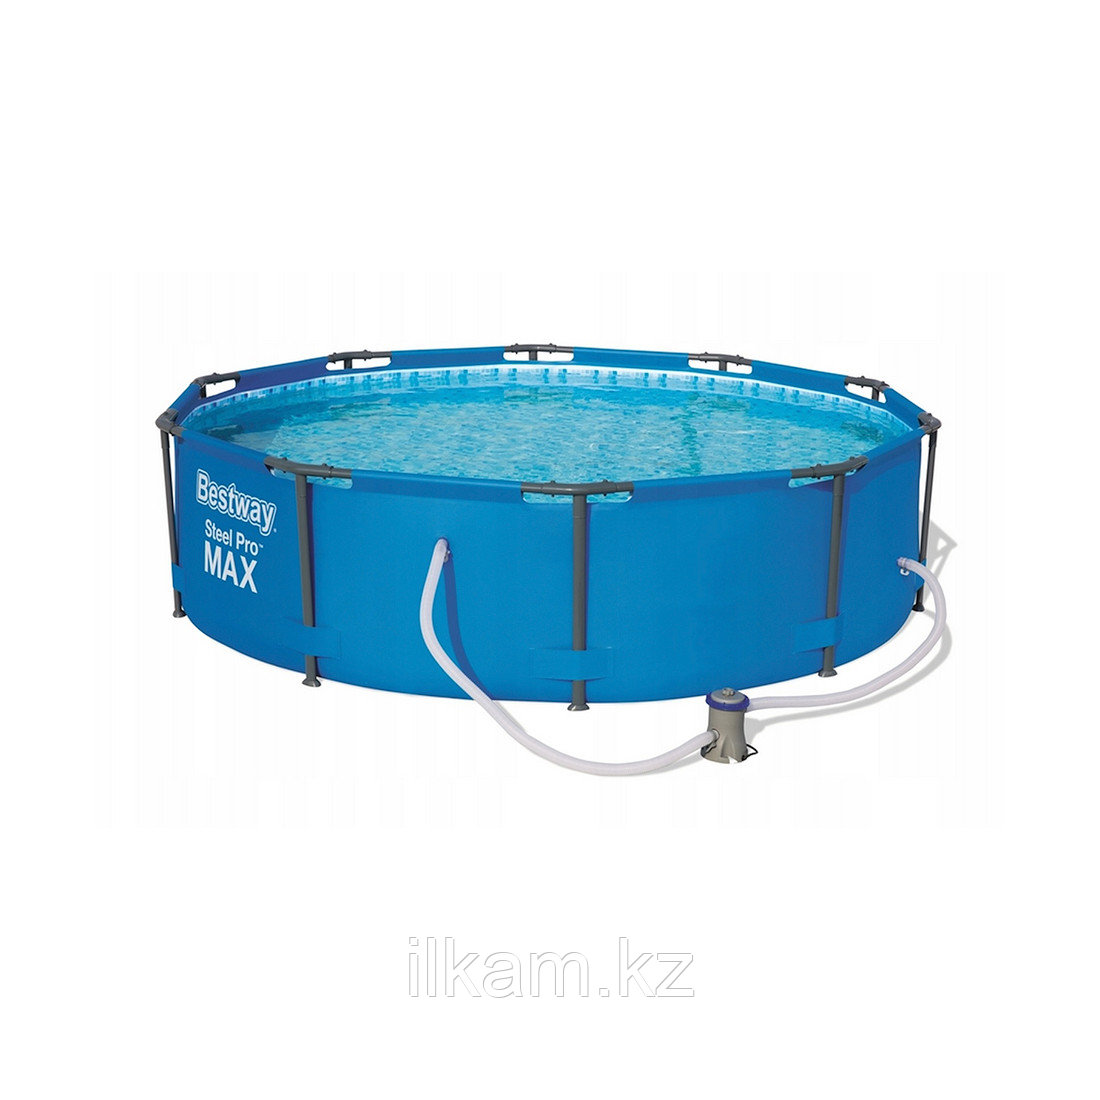 Каркасный бассейн Bestway 56984, Steel pro Max, размер 305х100 см